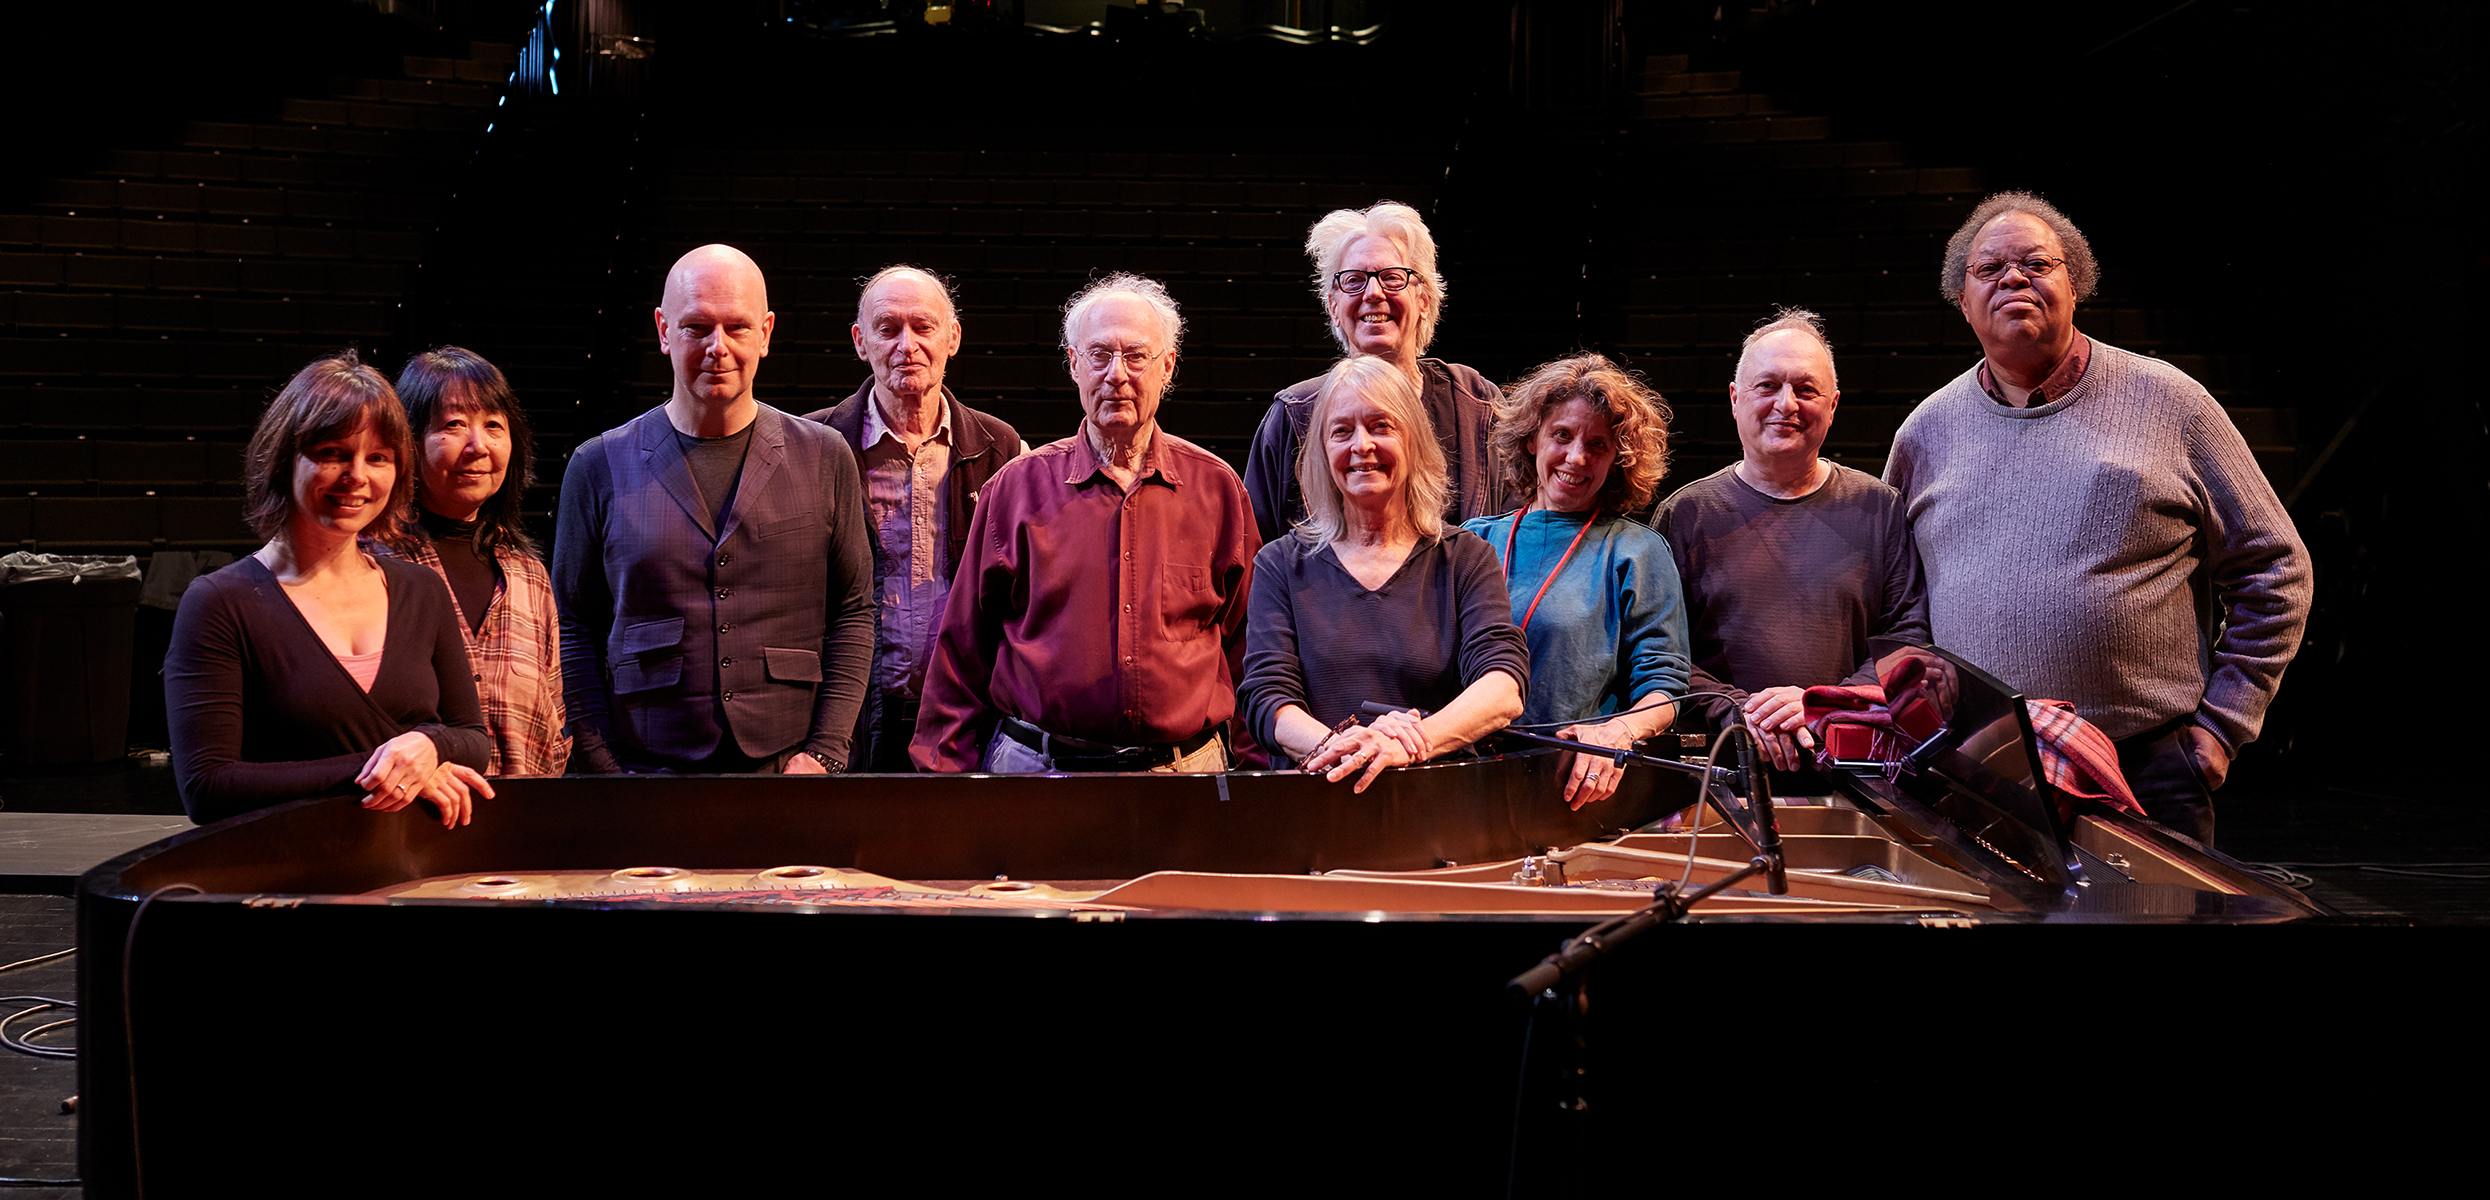 Left to right: Quinta, Ikue Mori, Philip Selway, Christian Wolff, David Behrman, Joan La Barbara, John King, Zeena Parkins, Fast Forward, George Lewis. Photo: Gene Pittman